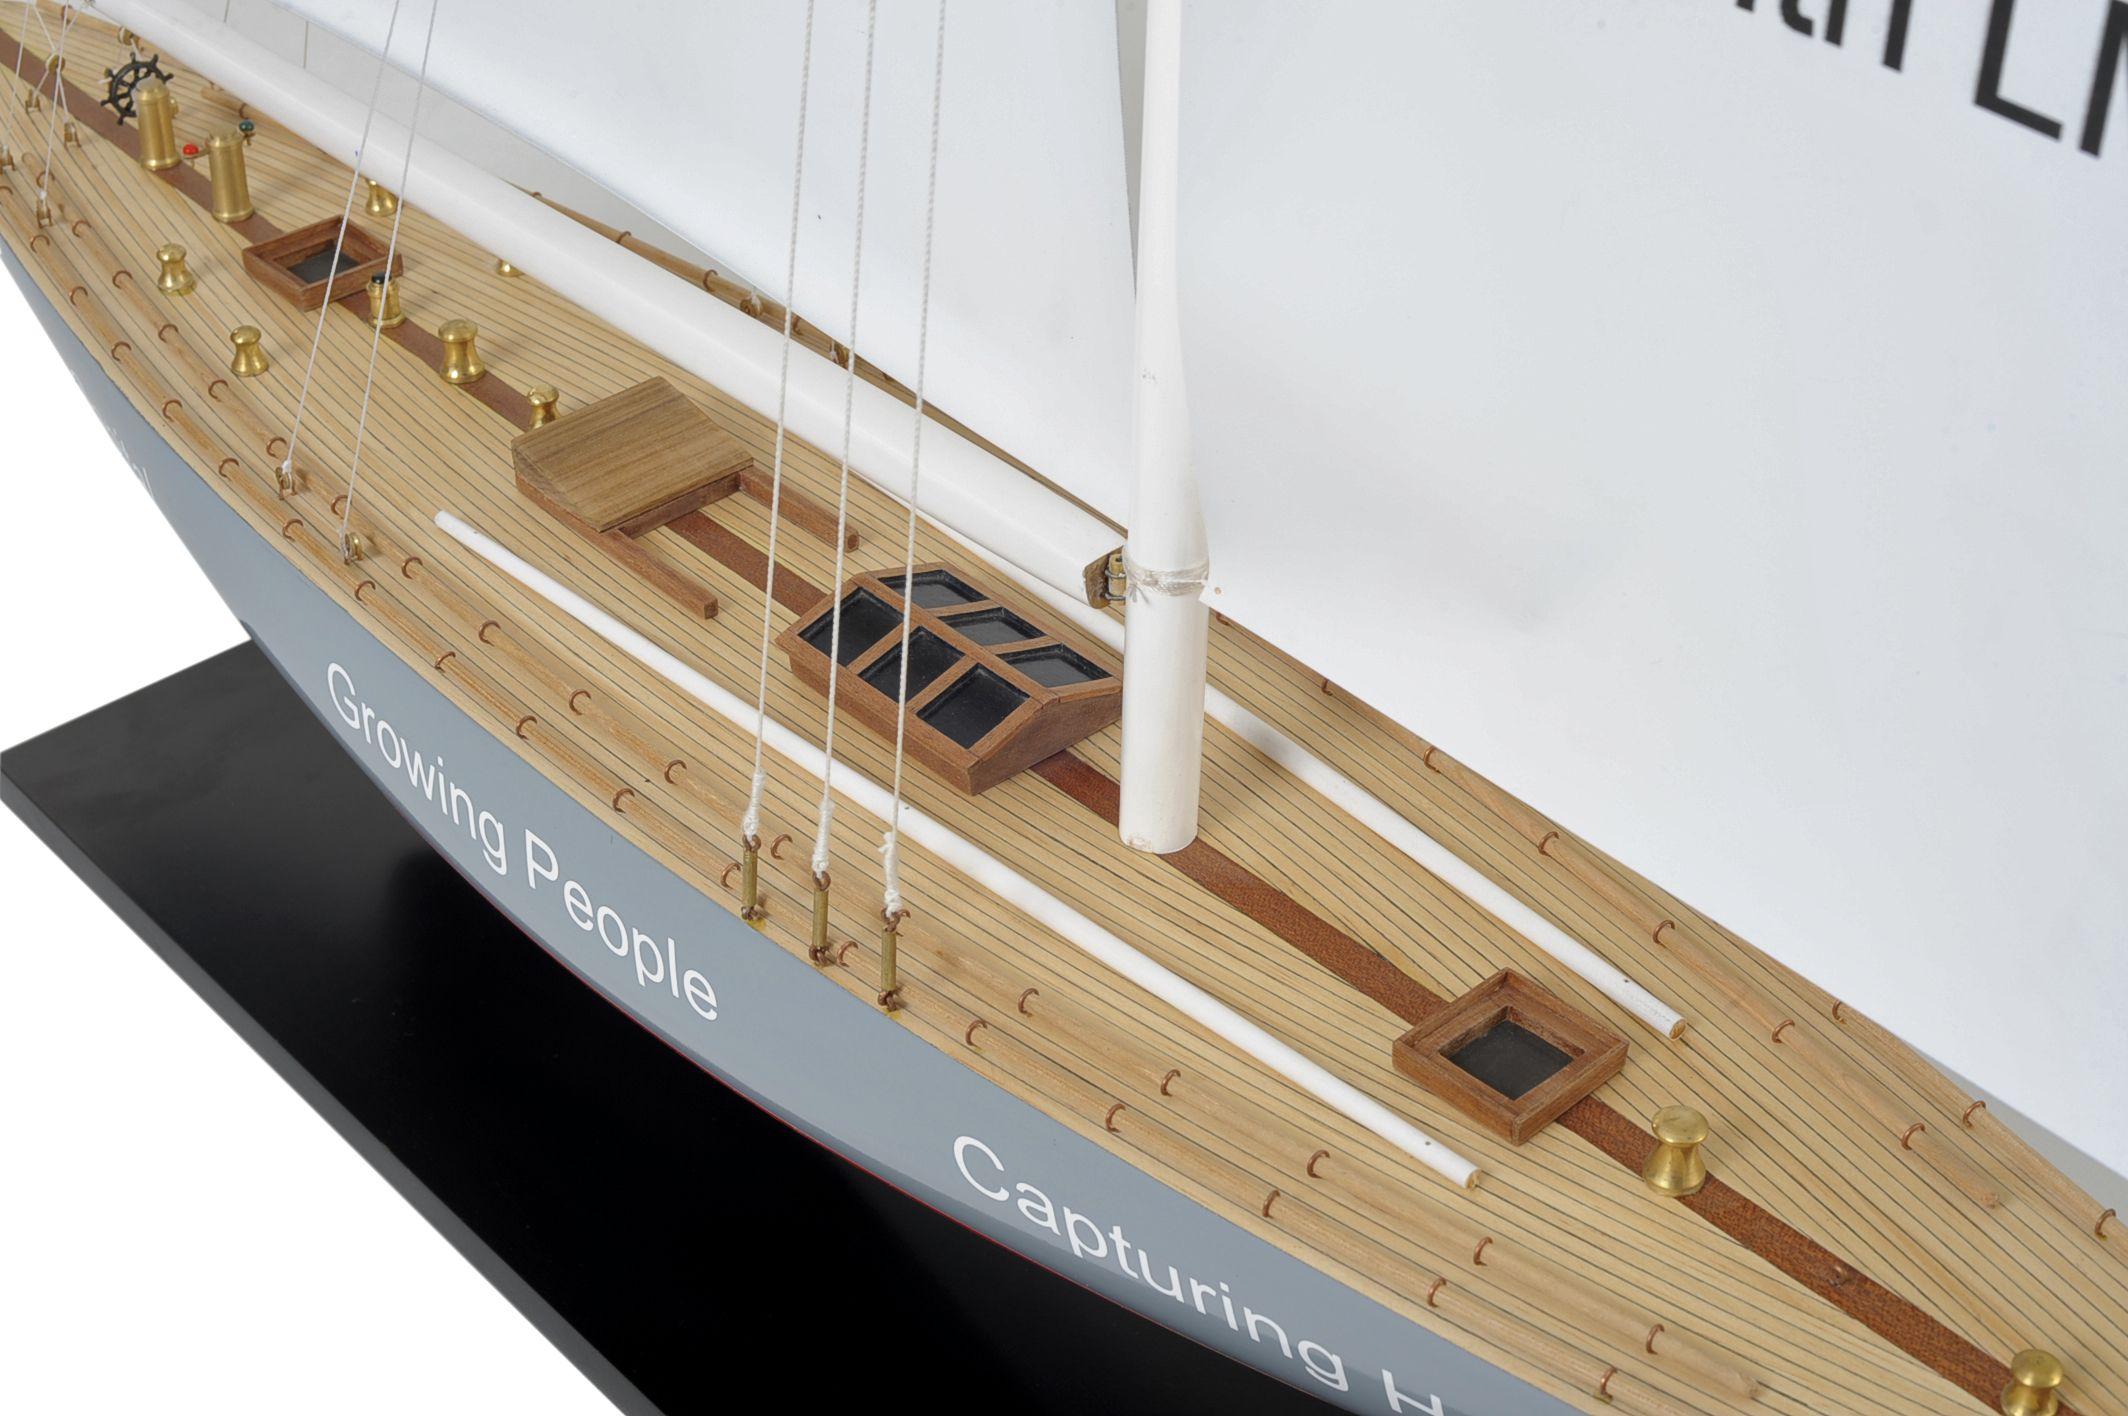 1519-8982-Enterprise-Model-Yacht